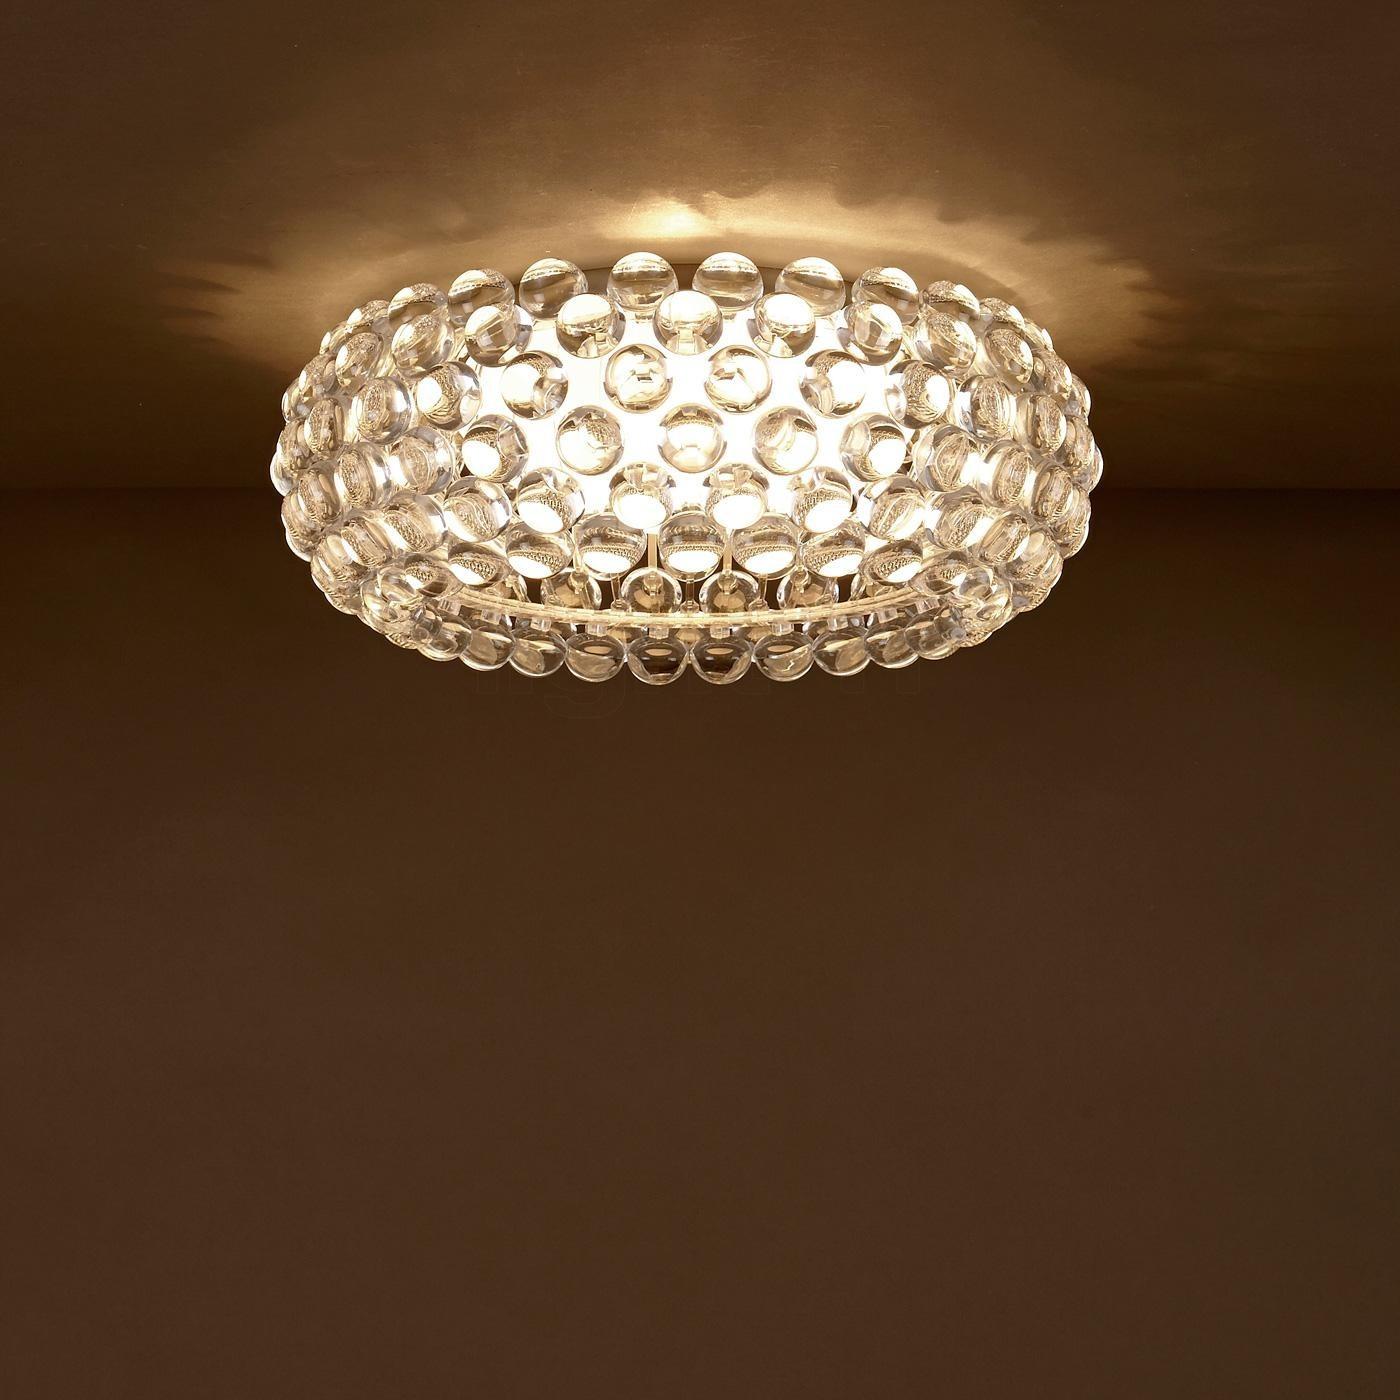 Foscarini caboche ceiling lamp for Caboche foscarini